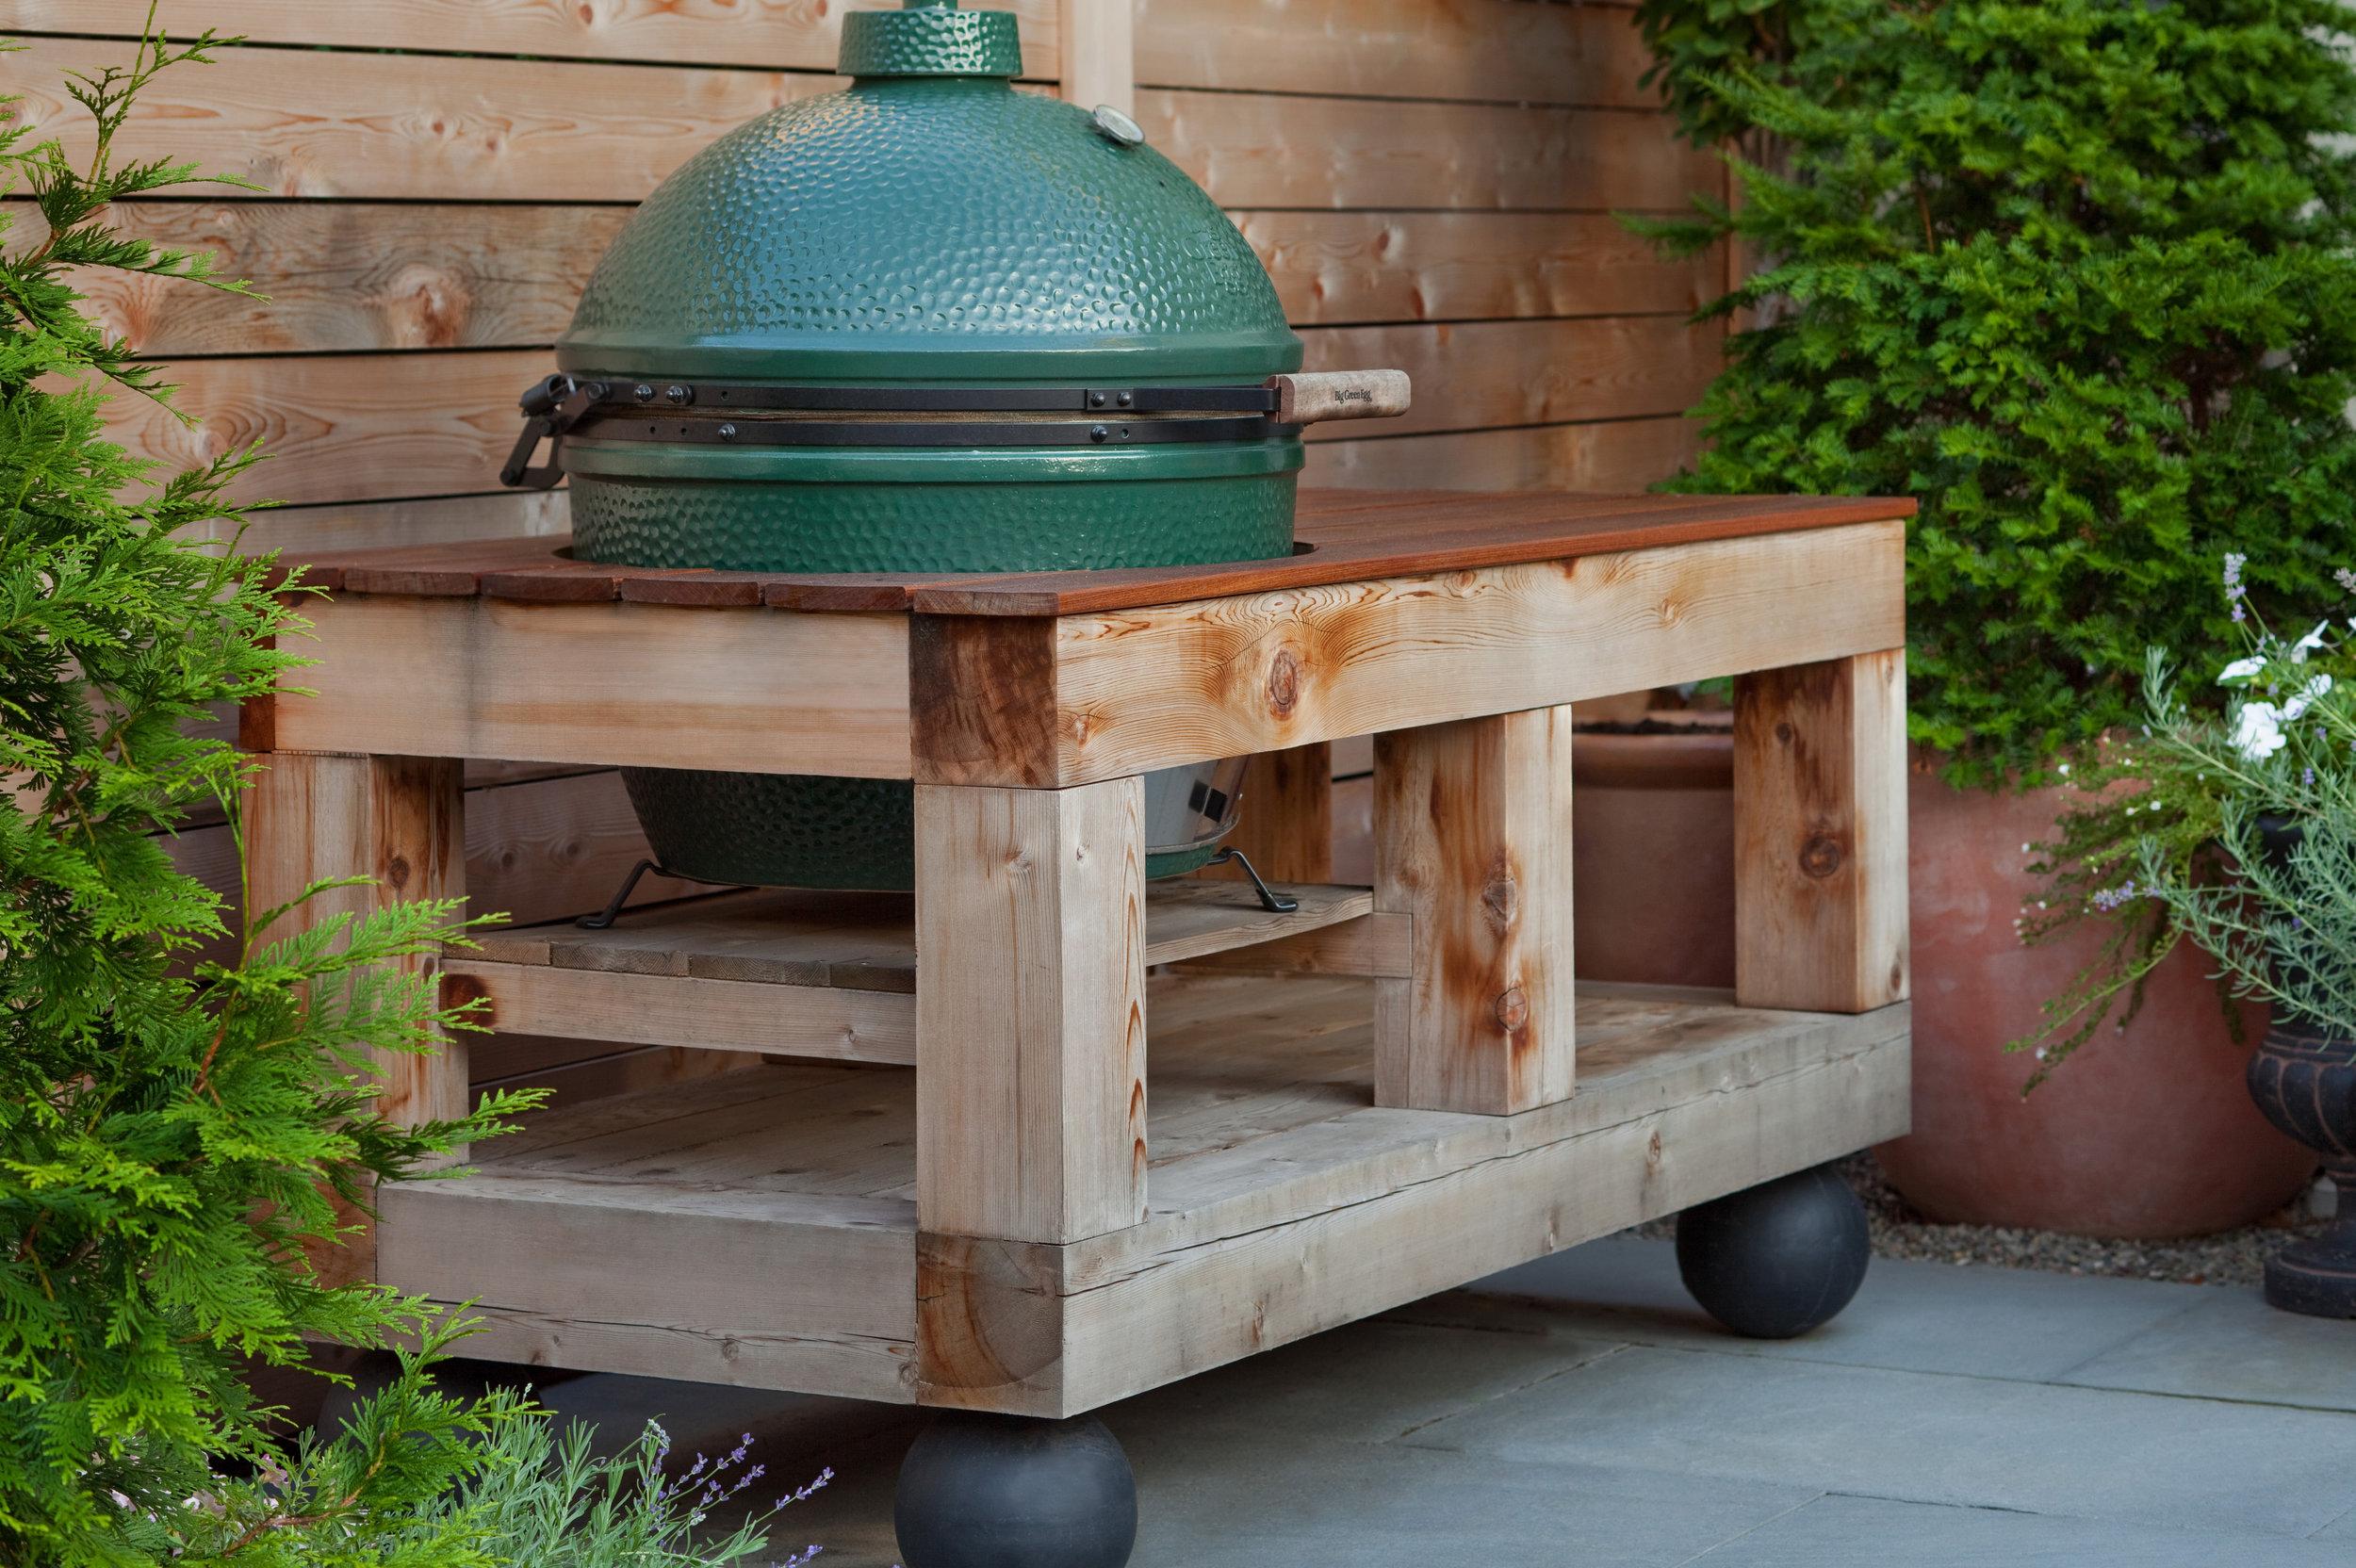 kamado_green_egg_ceramic_grill.jpg